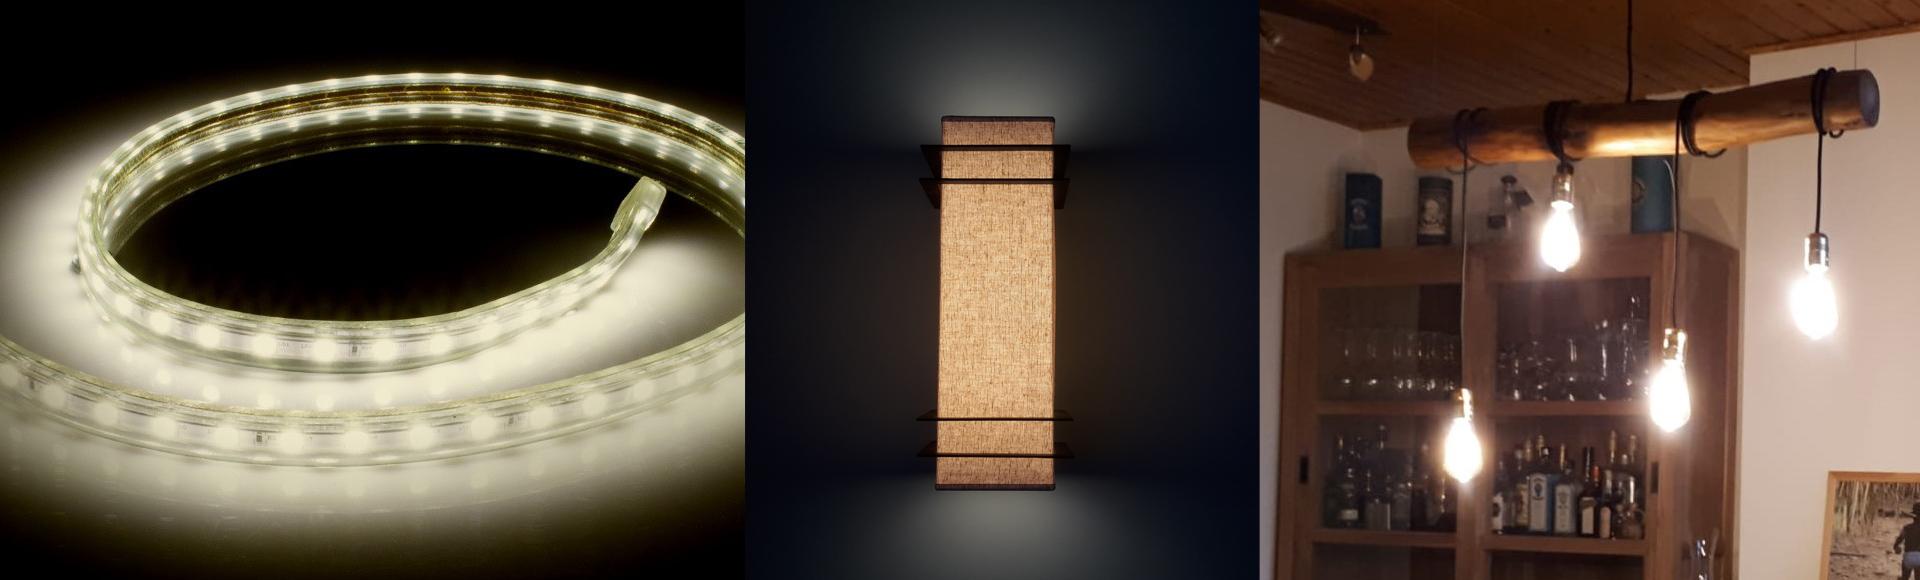 Expert luminaires - Eclairage intérieur - Wood and Light